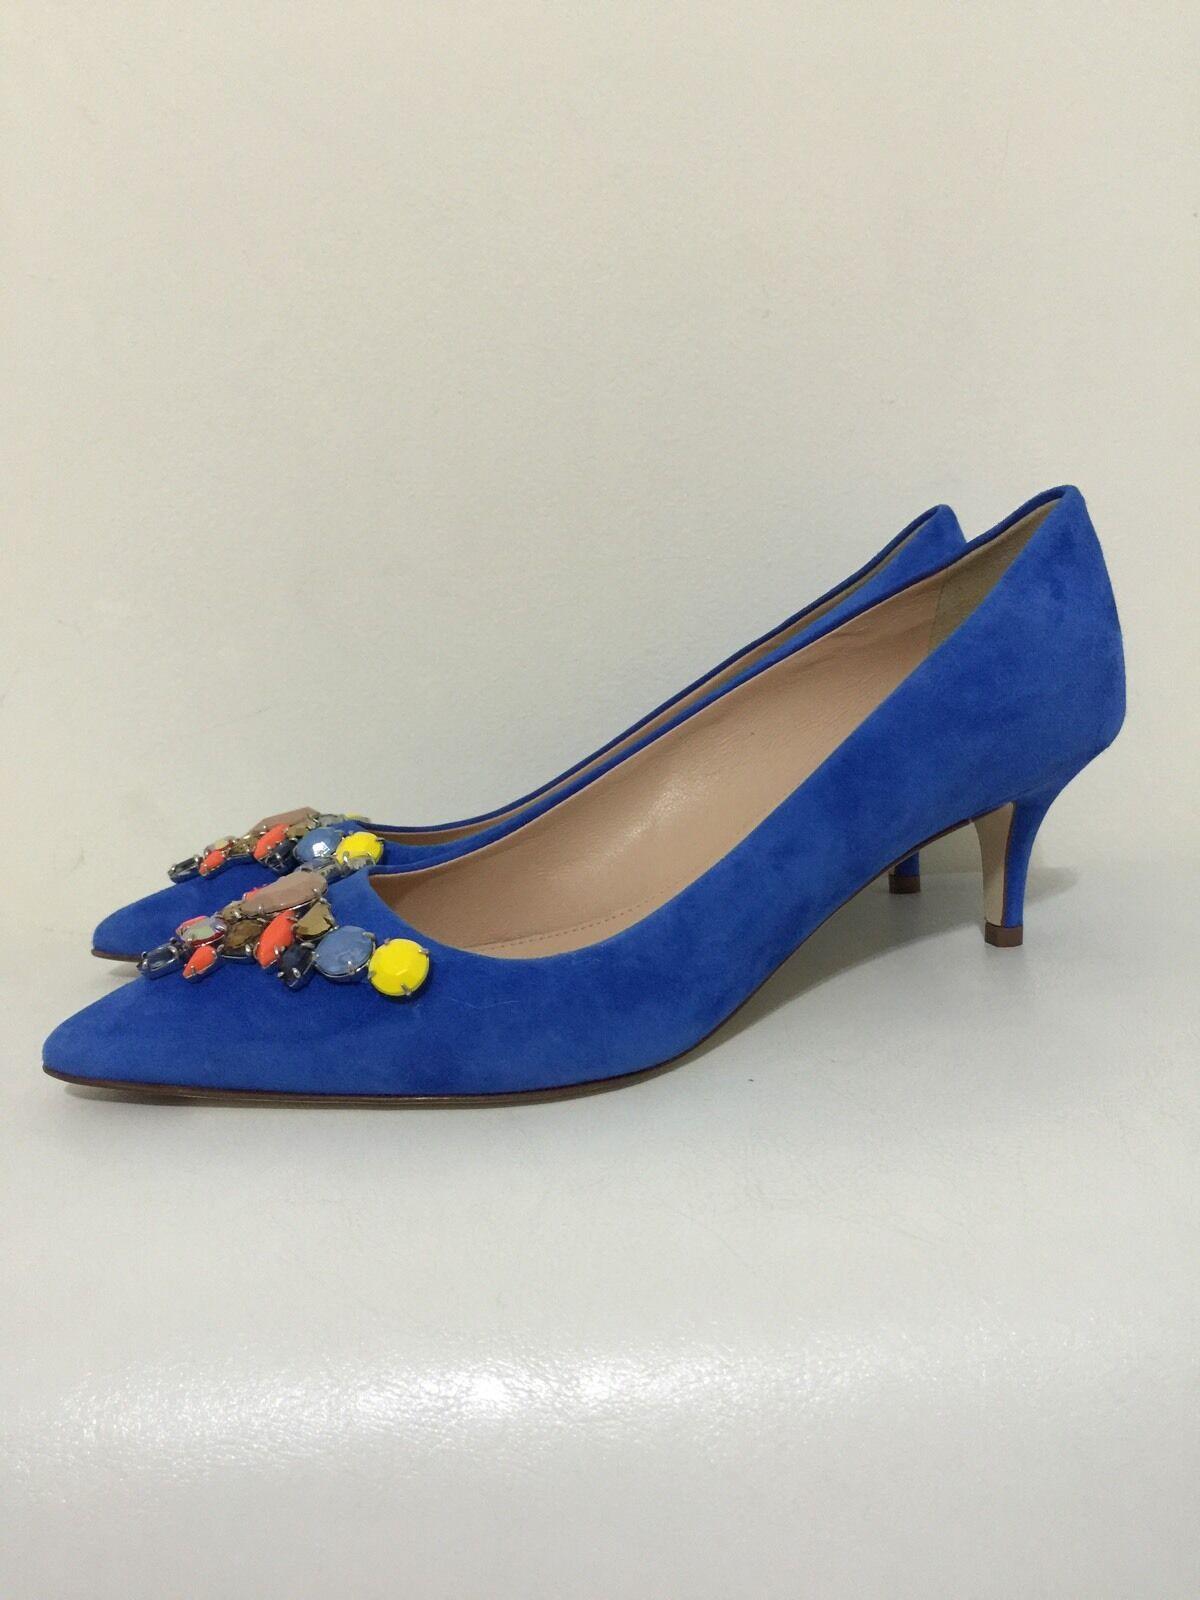 Colección 328 Nueva Colección  Dulci Gamuza Tacón Gatito Jcrew Enjoyado para mujer 7.5 Azul Italia cb5cec